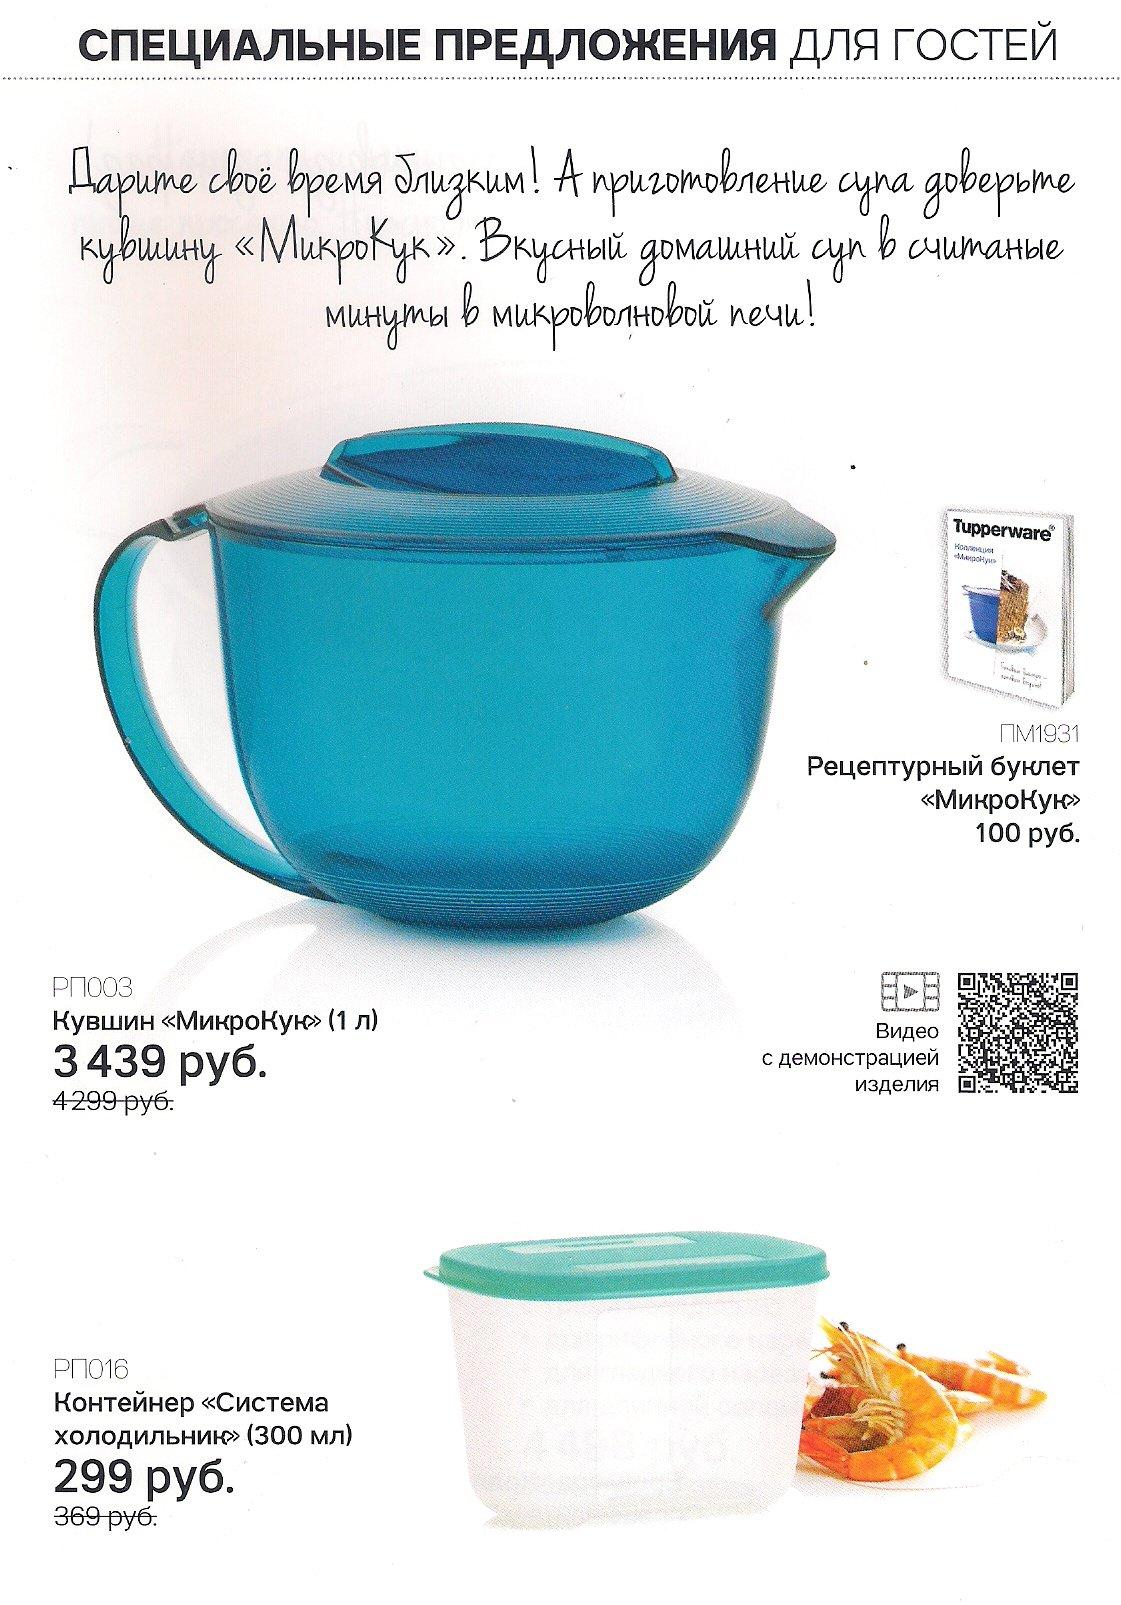 http://tupperware-online.ru/images/upload/13g.jpg